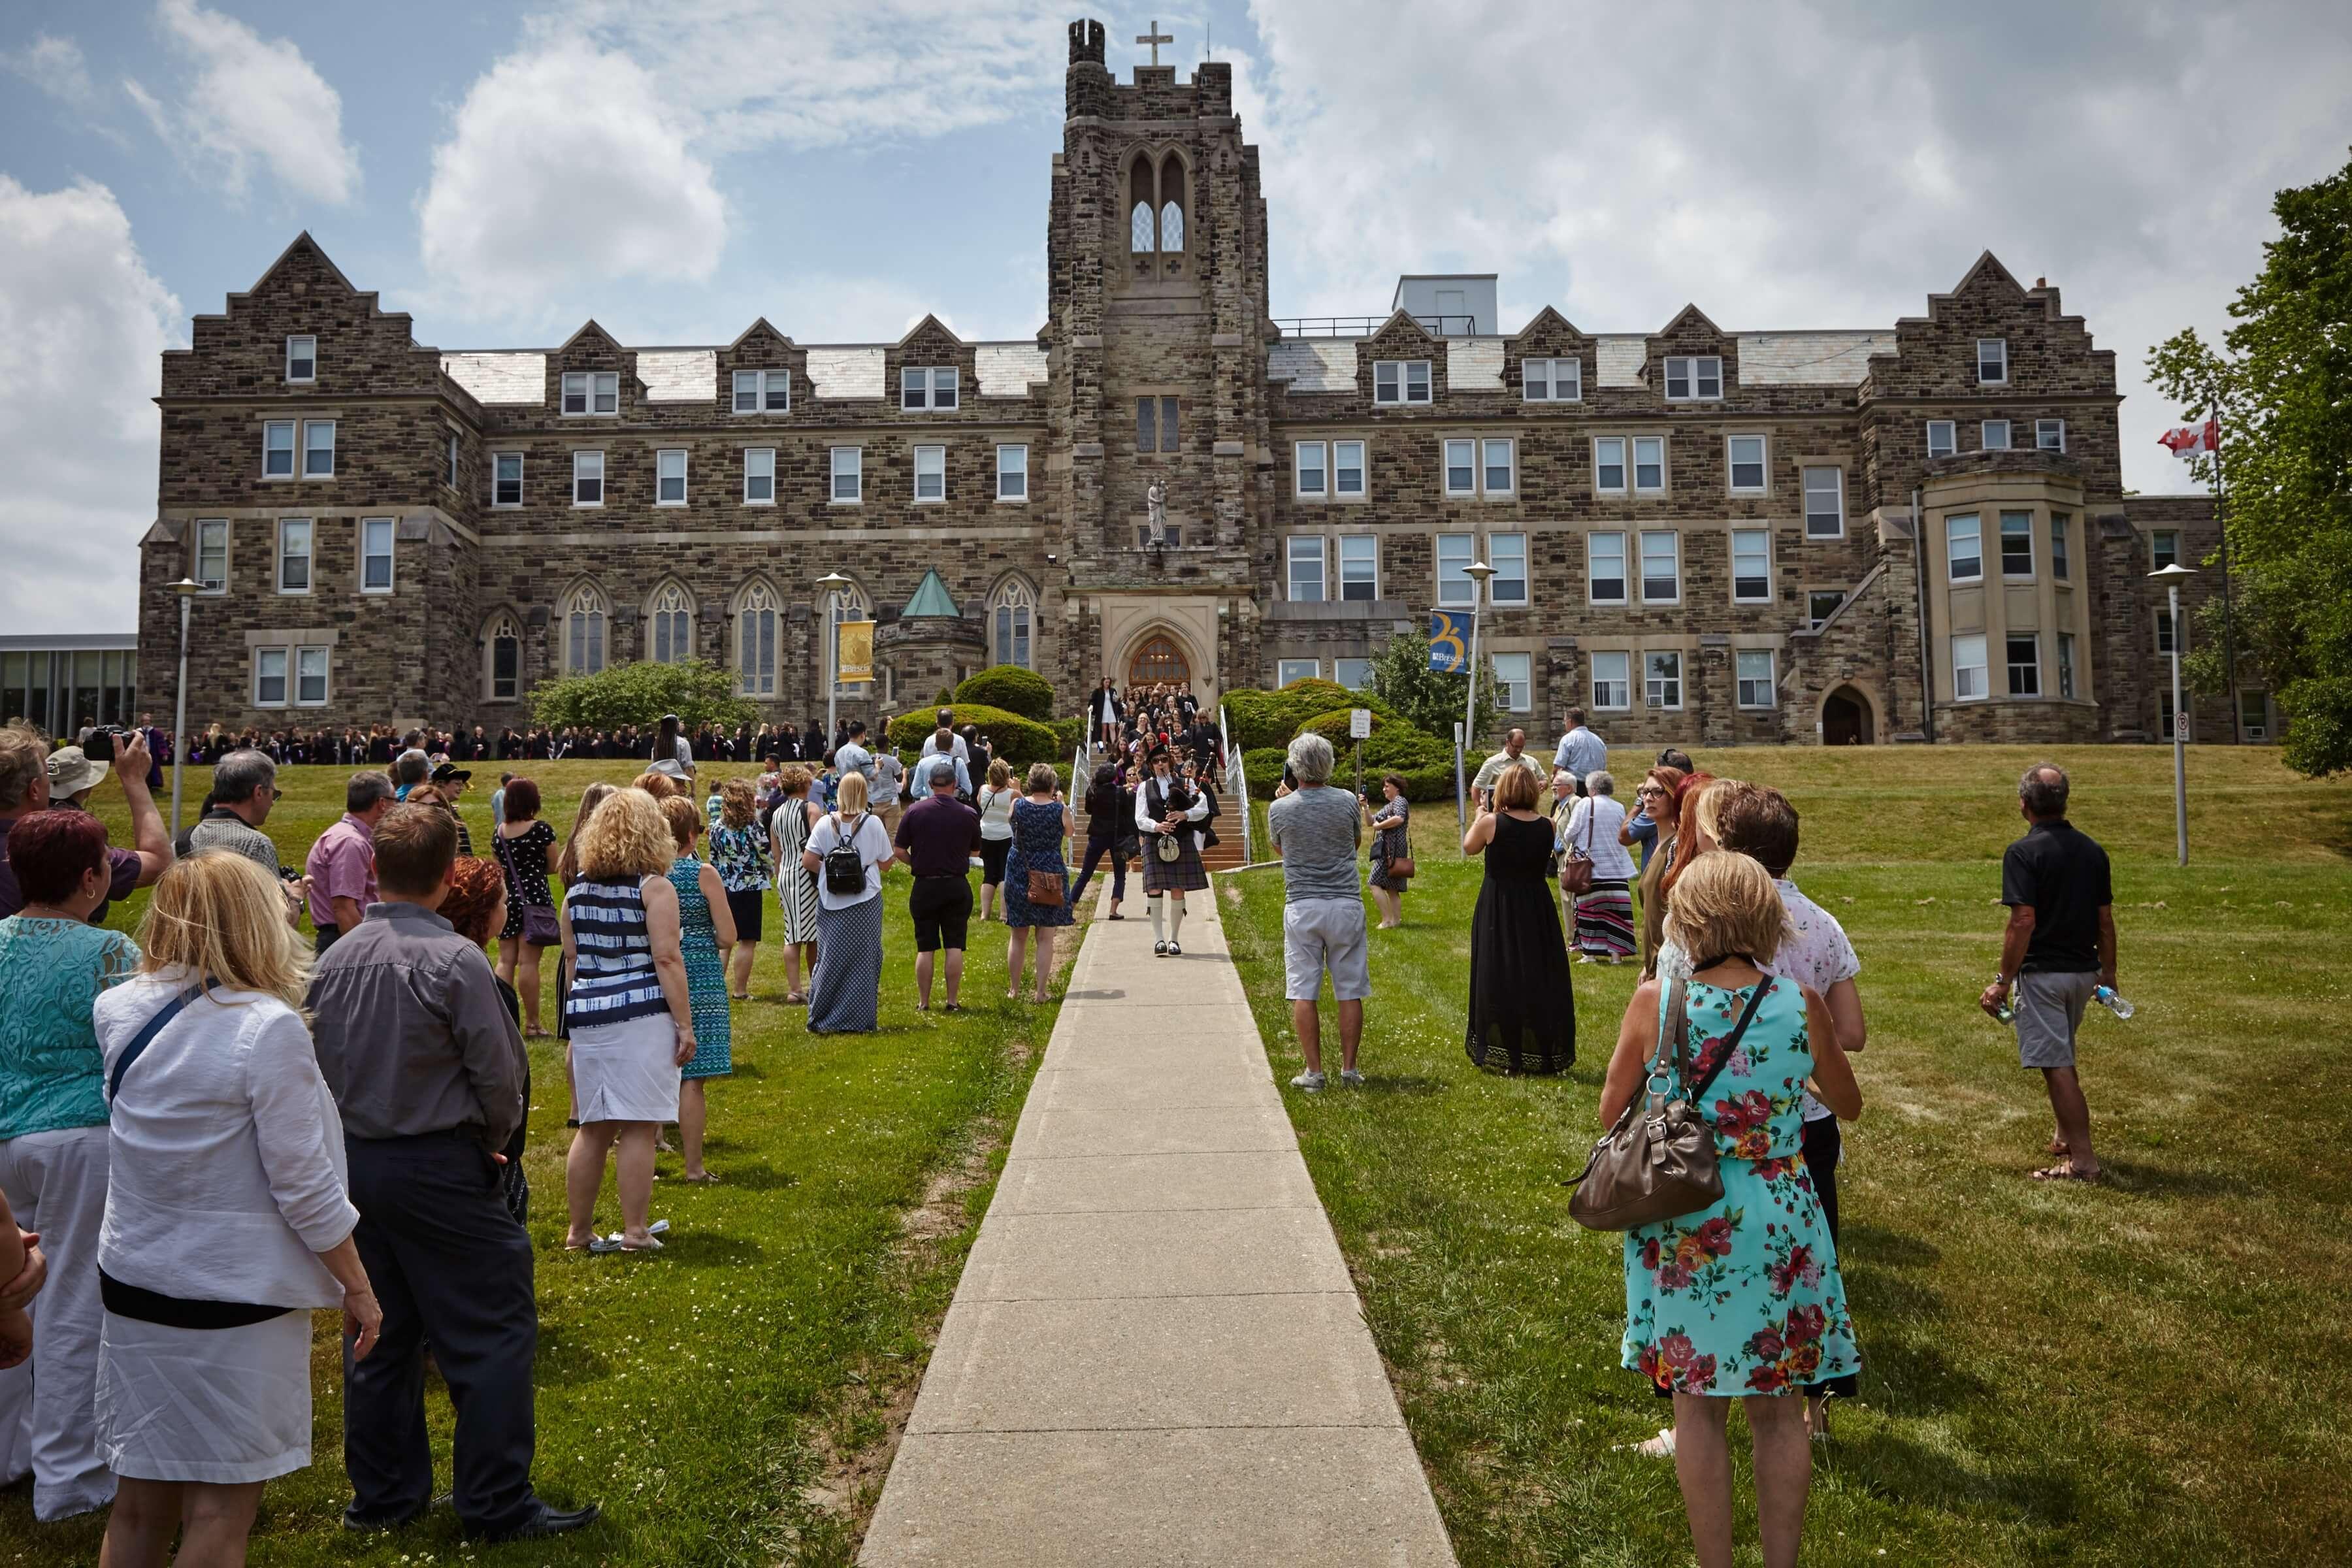 crowd in front of brescia university college building